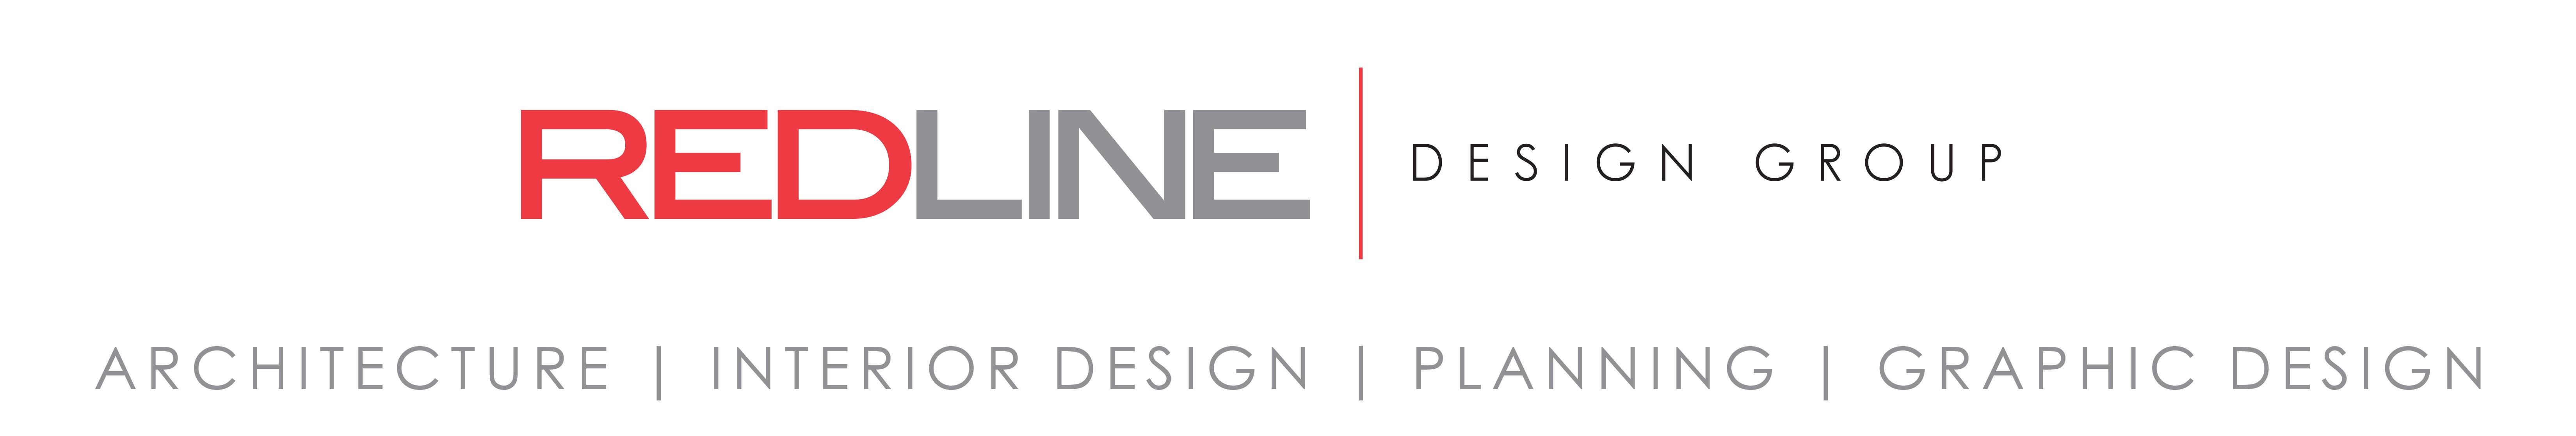 Redline Design Group